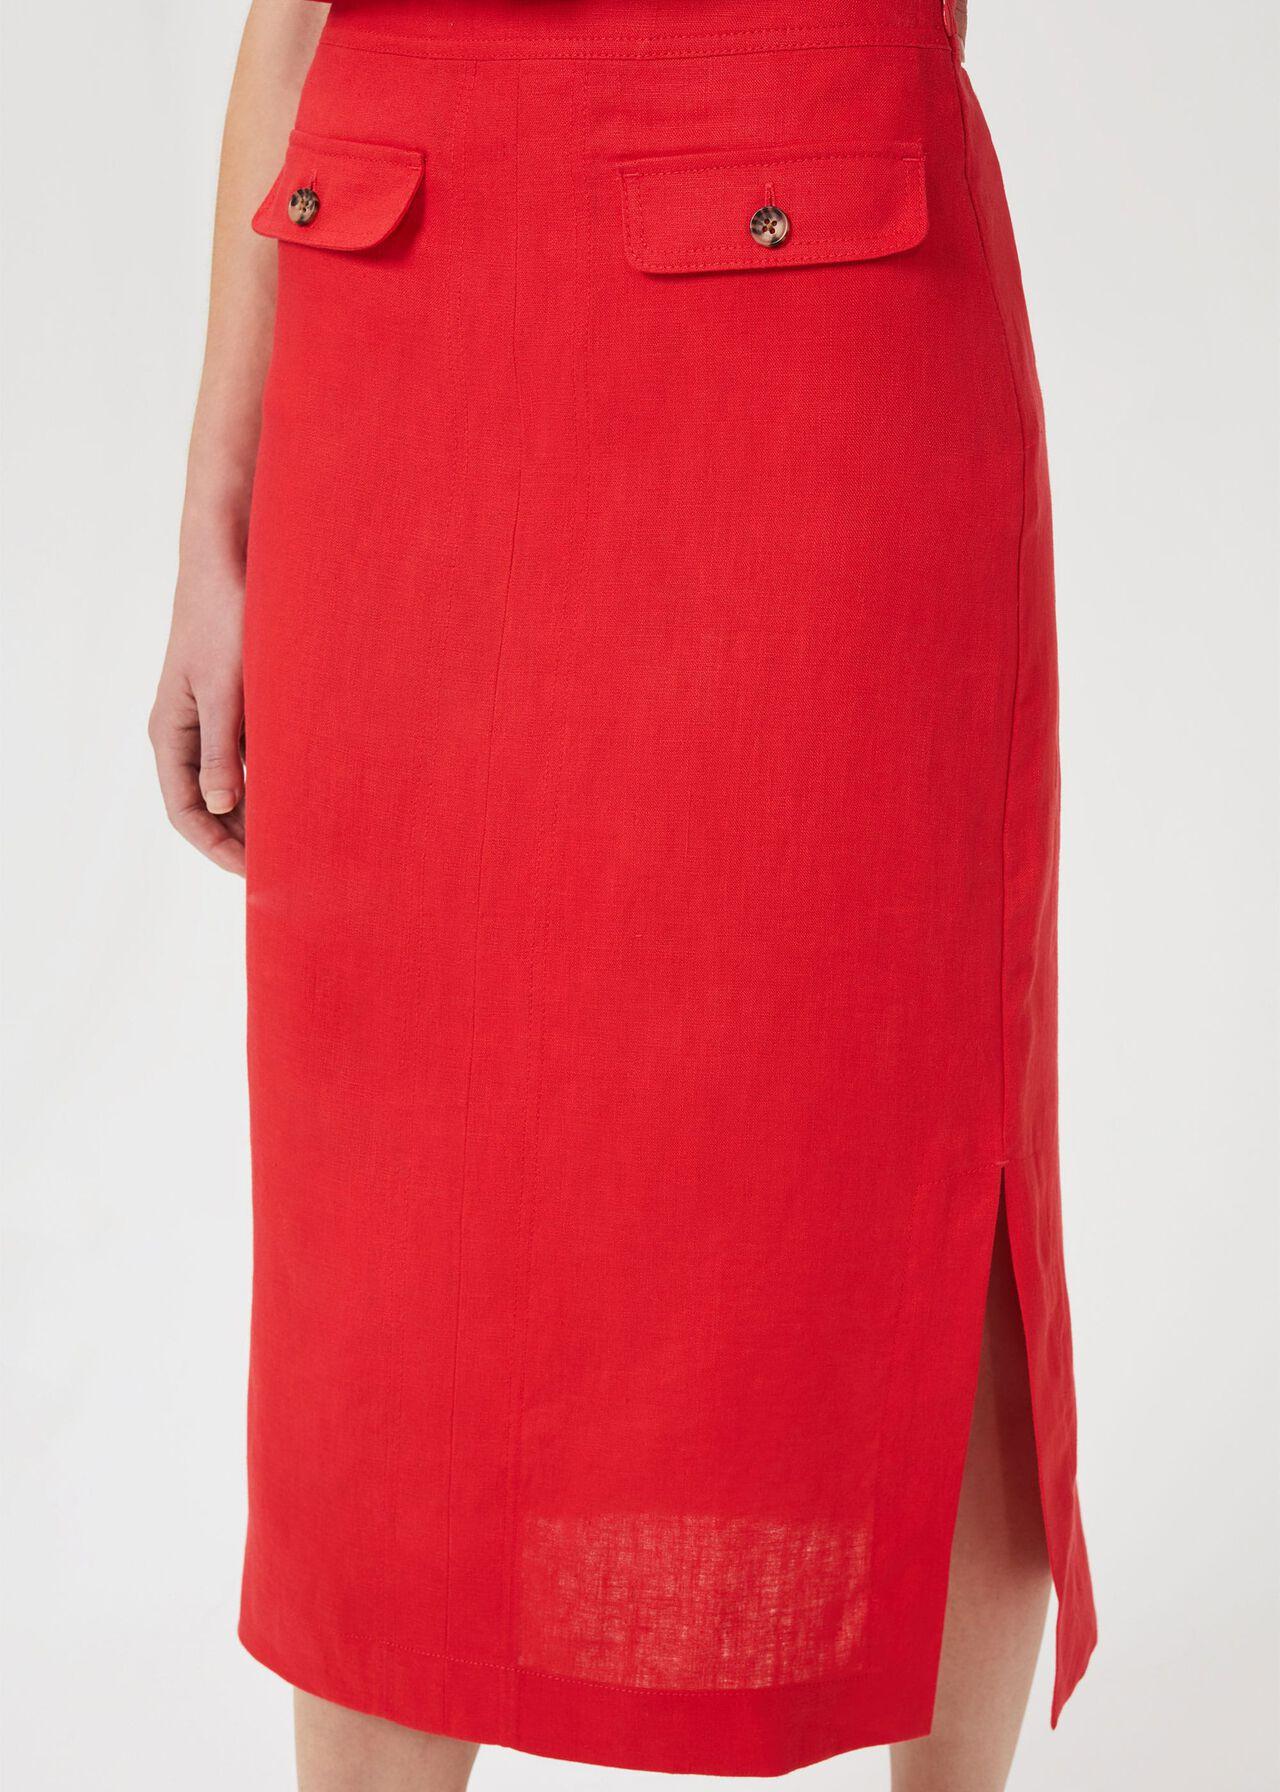 Georgiana Linen Skirt, Coral Red, hi-res